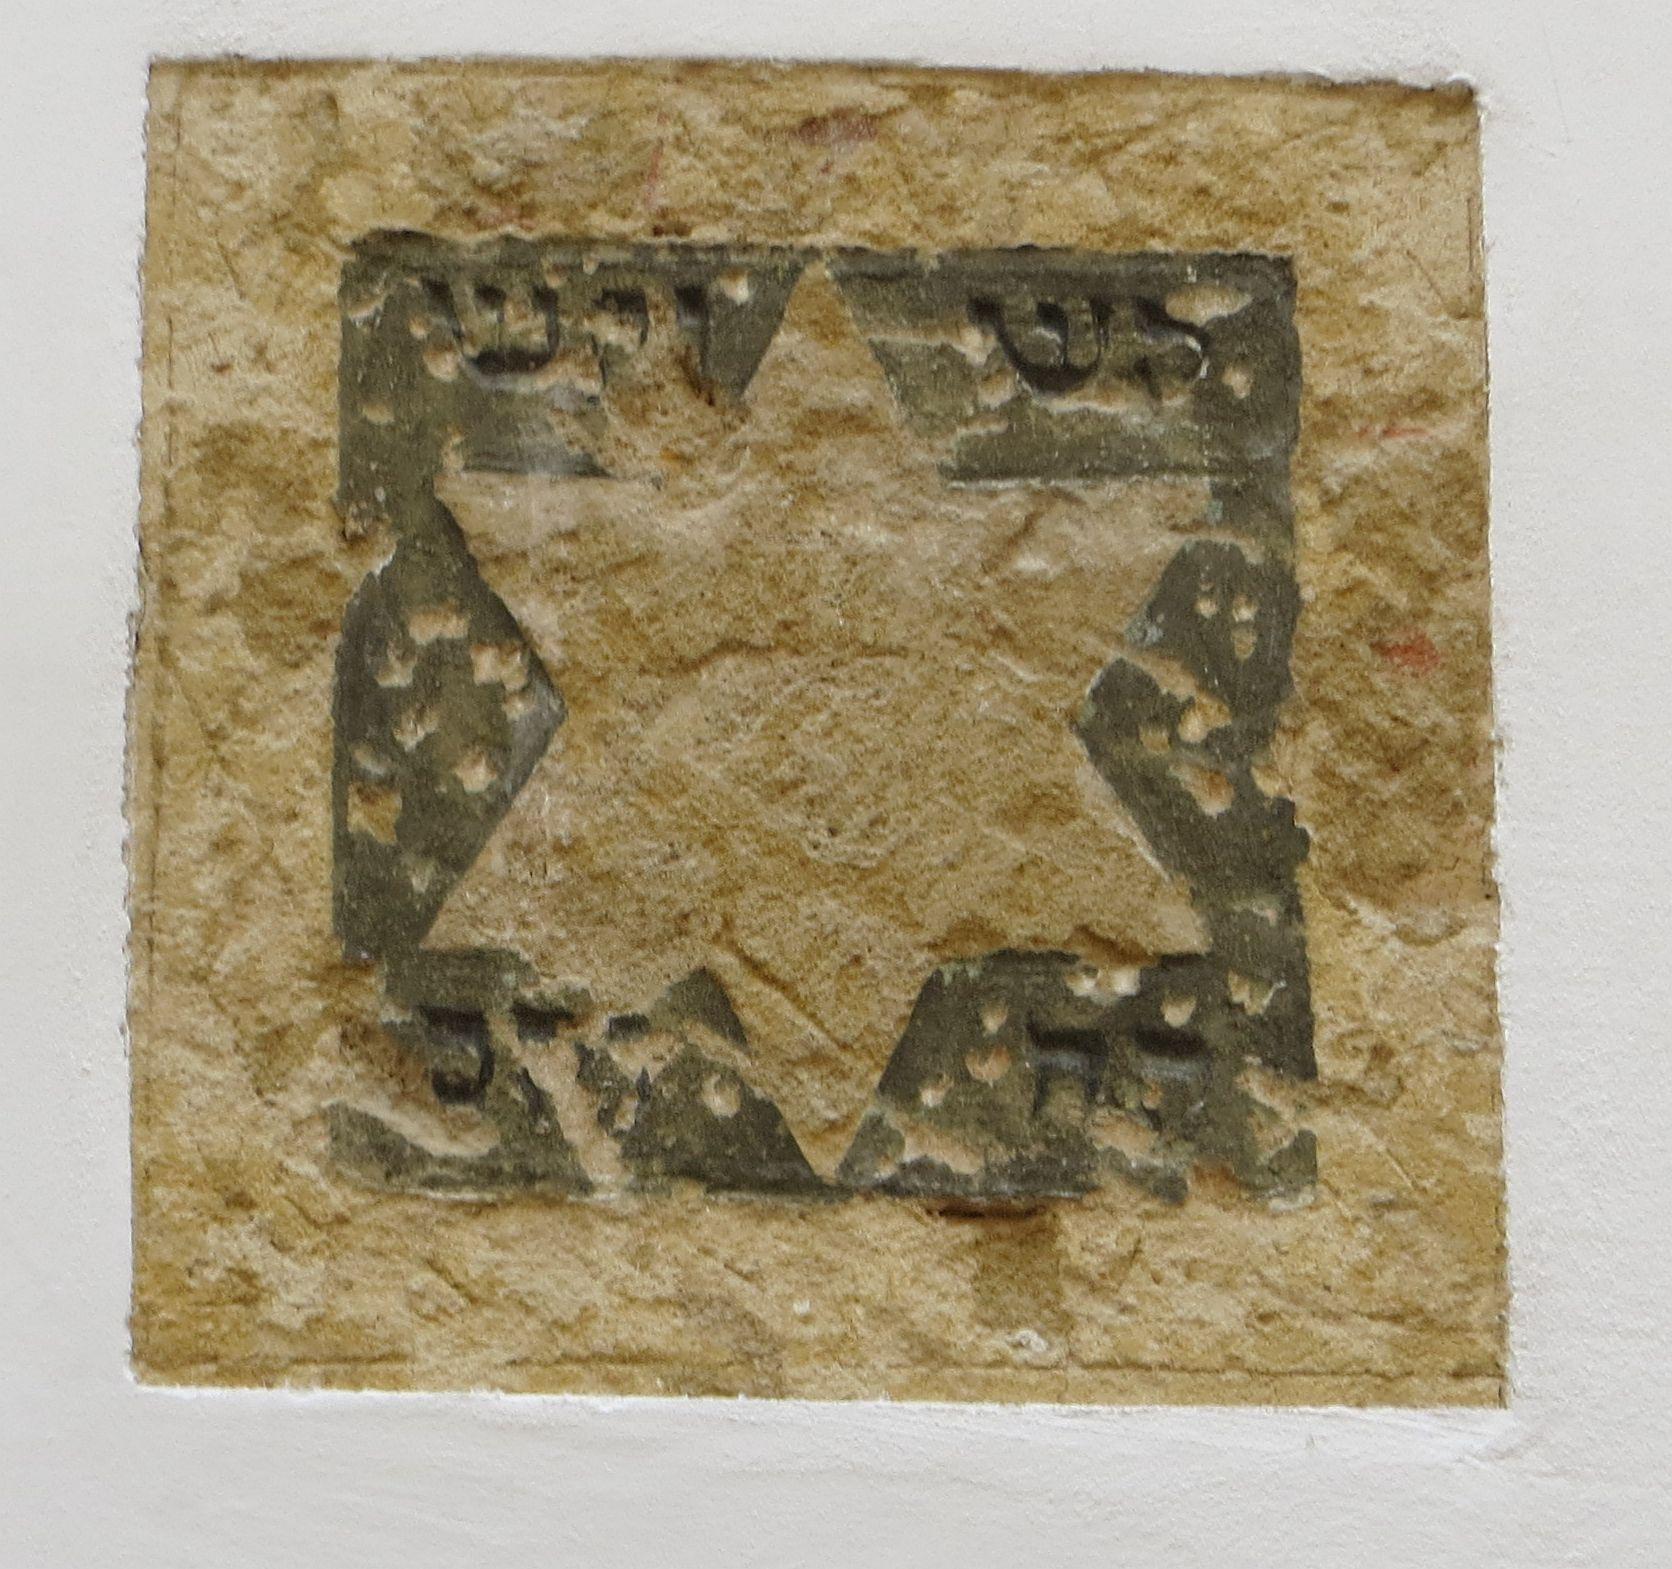 http://www.alemannia-judaica.de/images/Images%20354/Sulzbach-Rosenberg%2011092013%20113.jpg